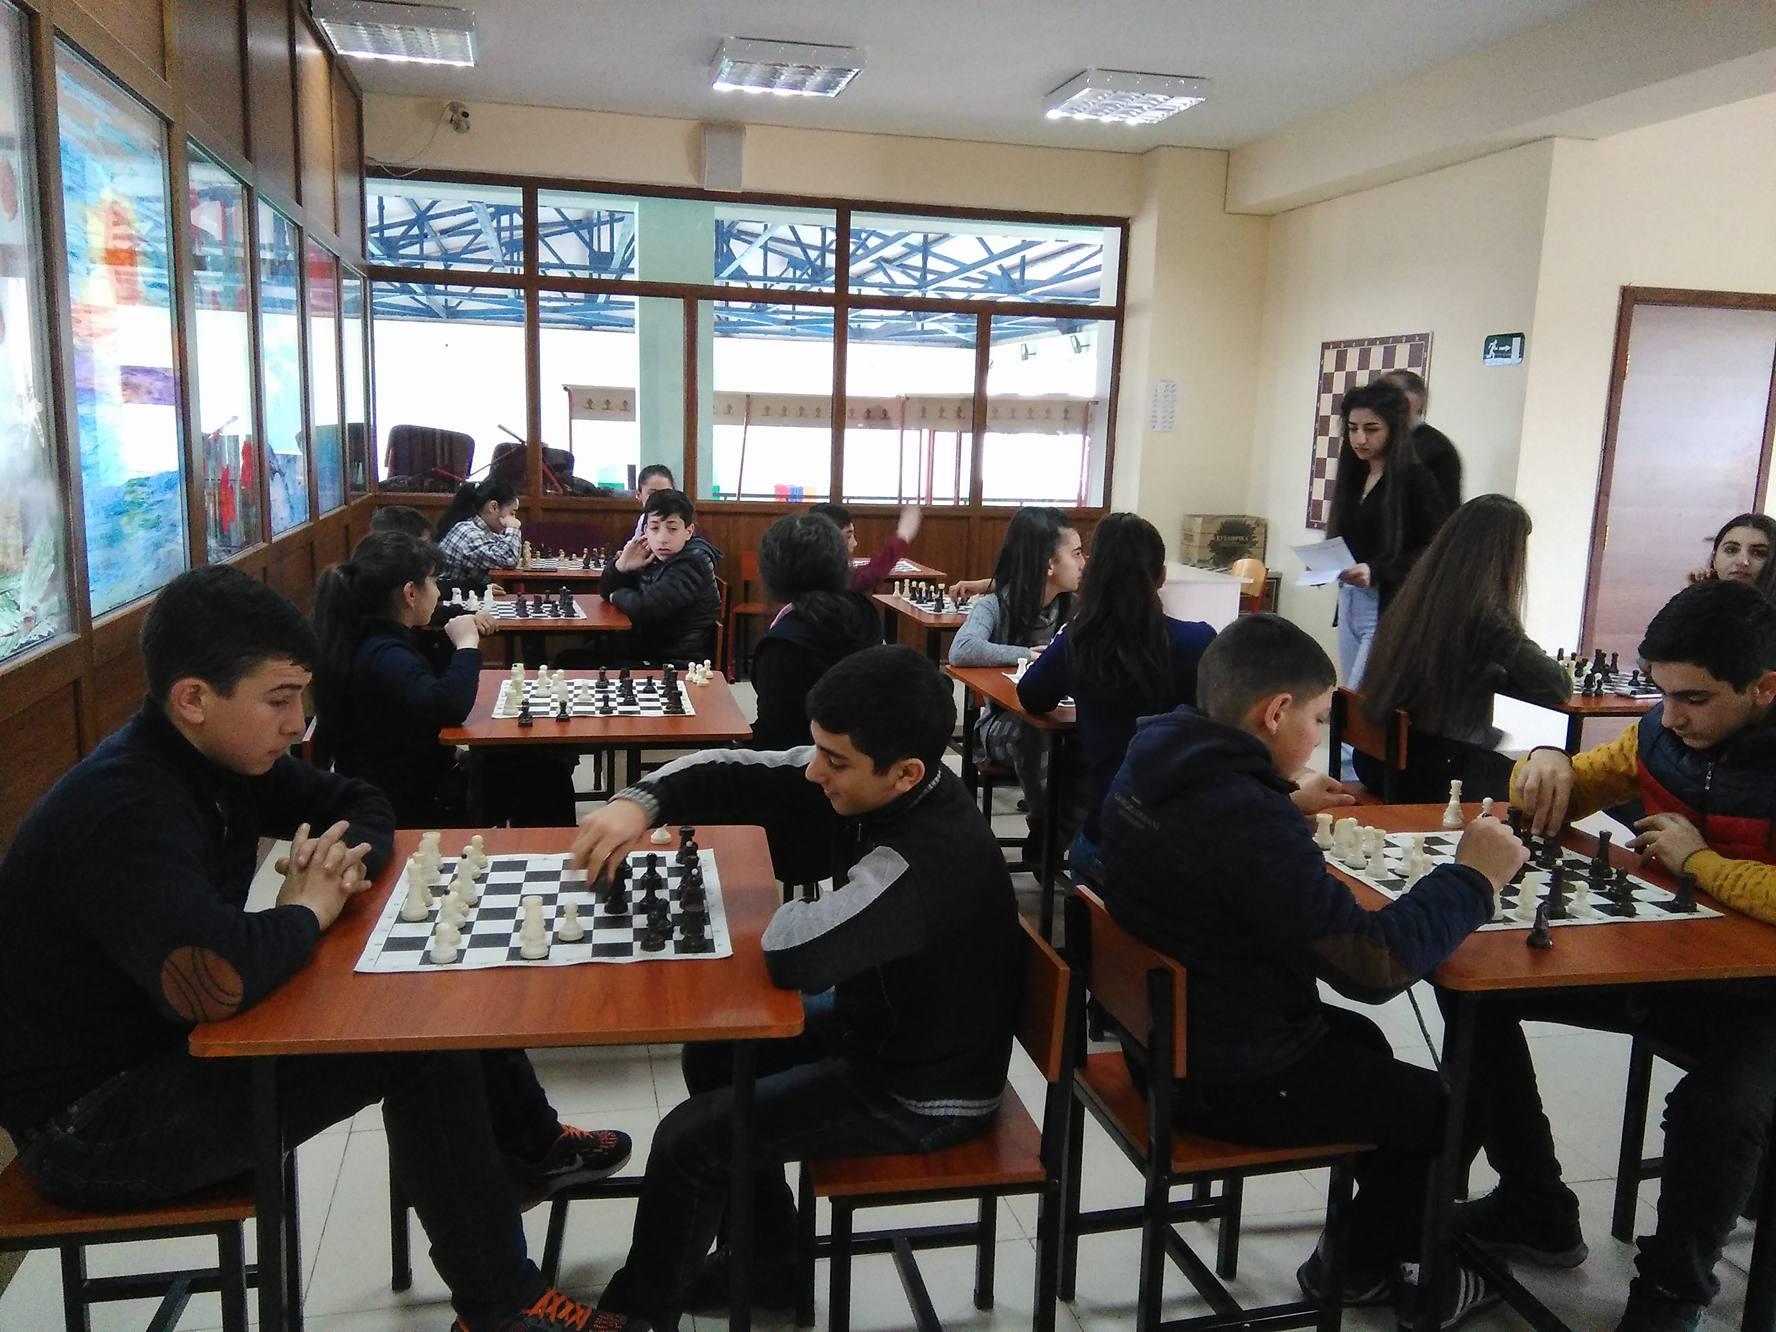 Chess matches at the Vahan Tekeyan School No. 6 of Stepanavan in March 2018